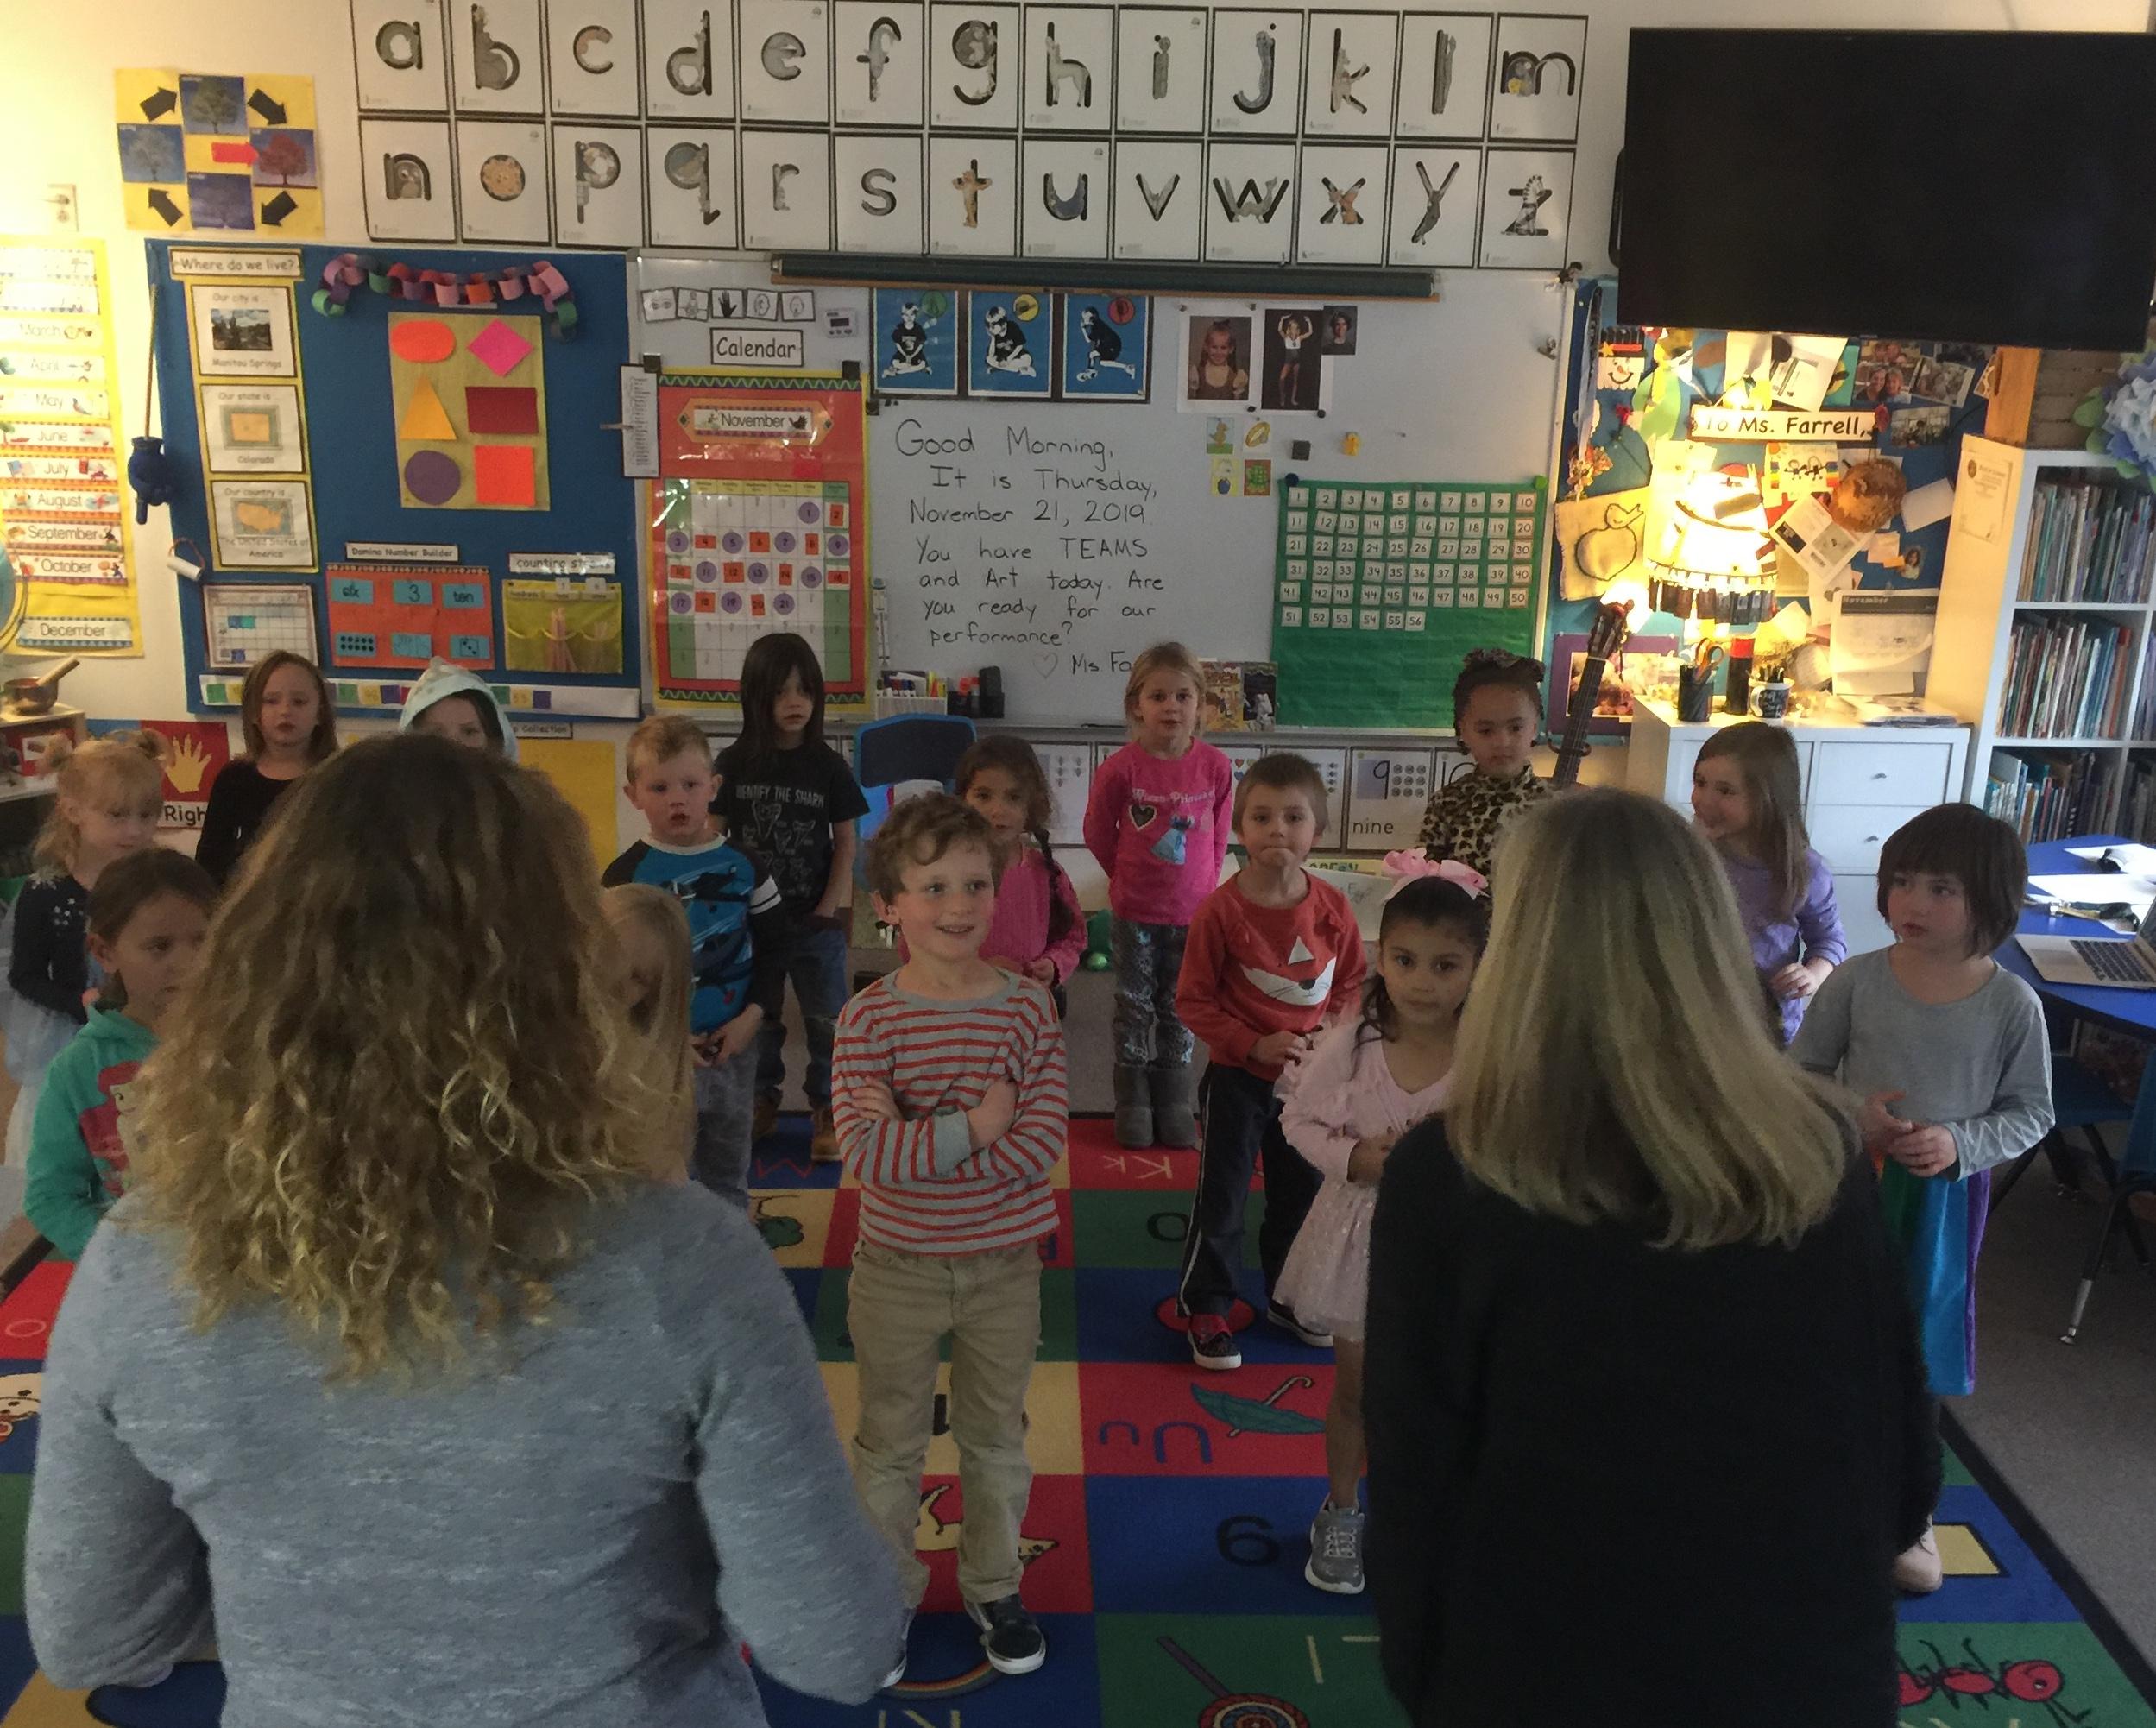 Ms Farrells kindergarten class Manitou Elementary